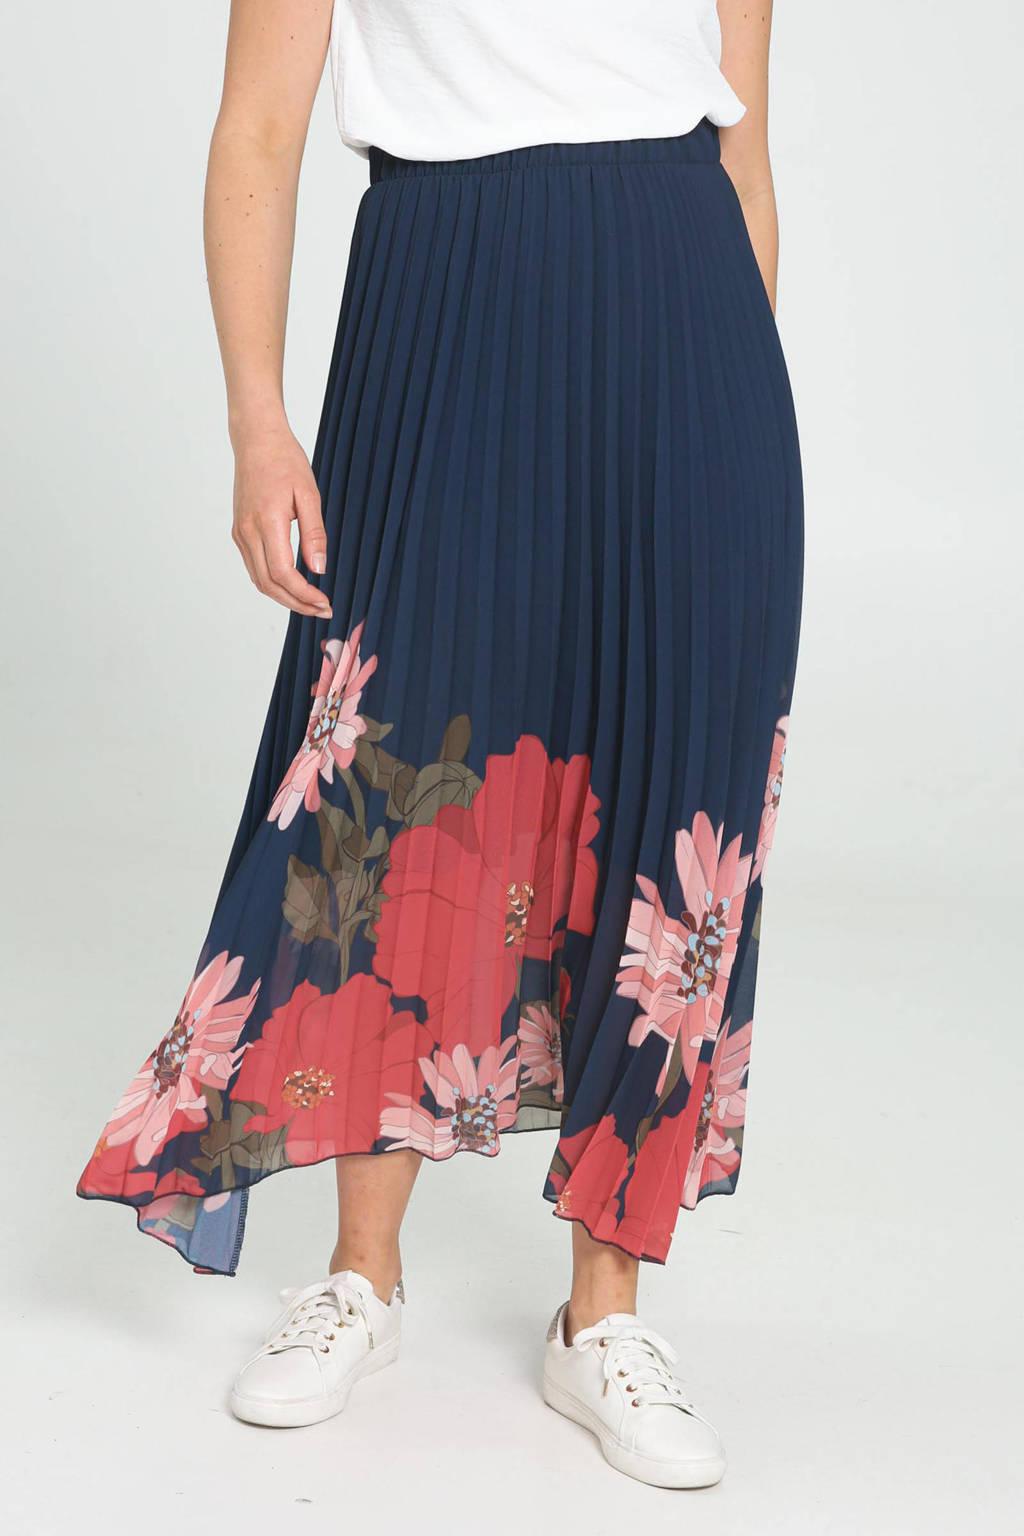 Cassis gebloemde semi-transparante rok marine/rood/roze, Marine/rood/roze